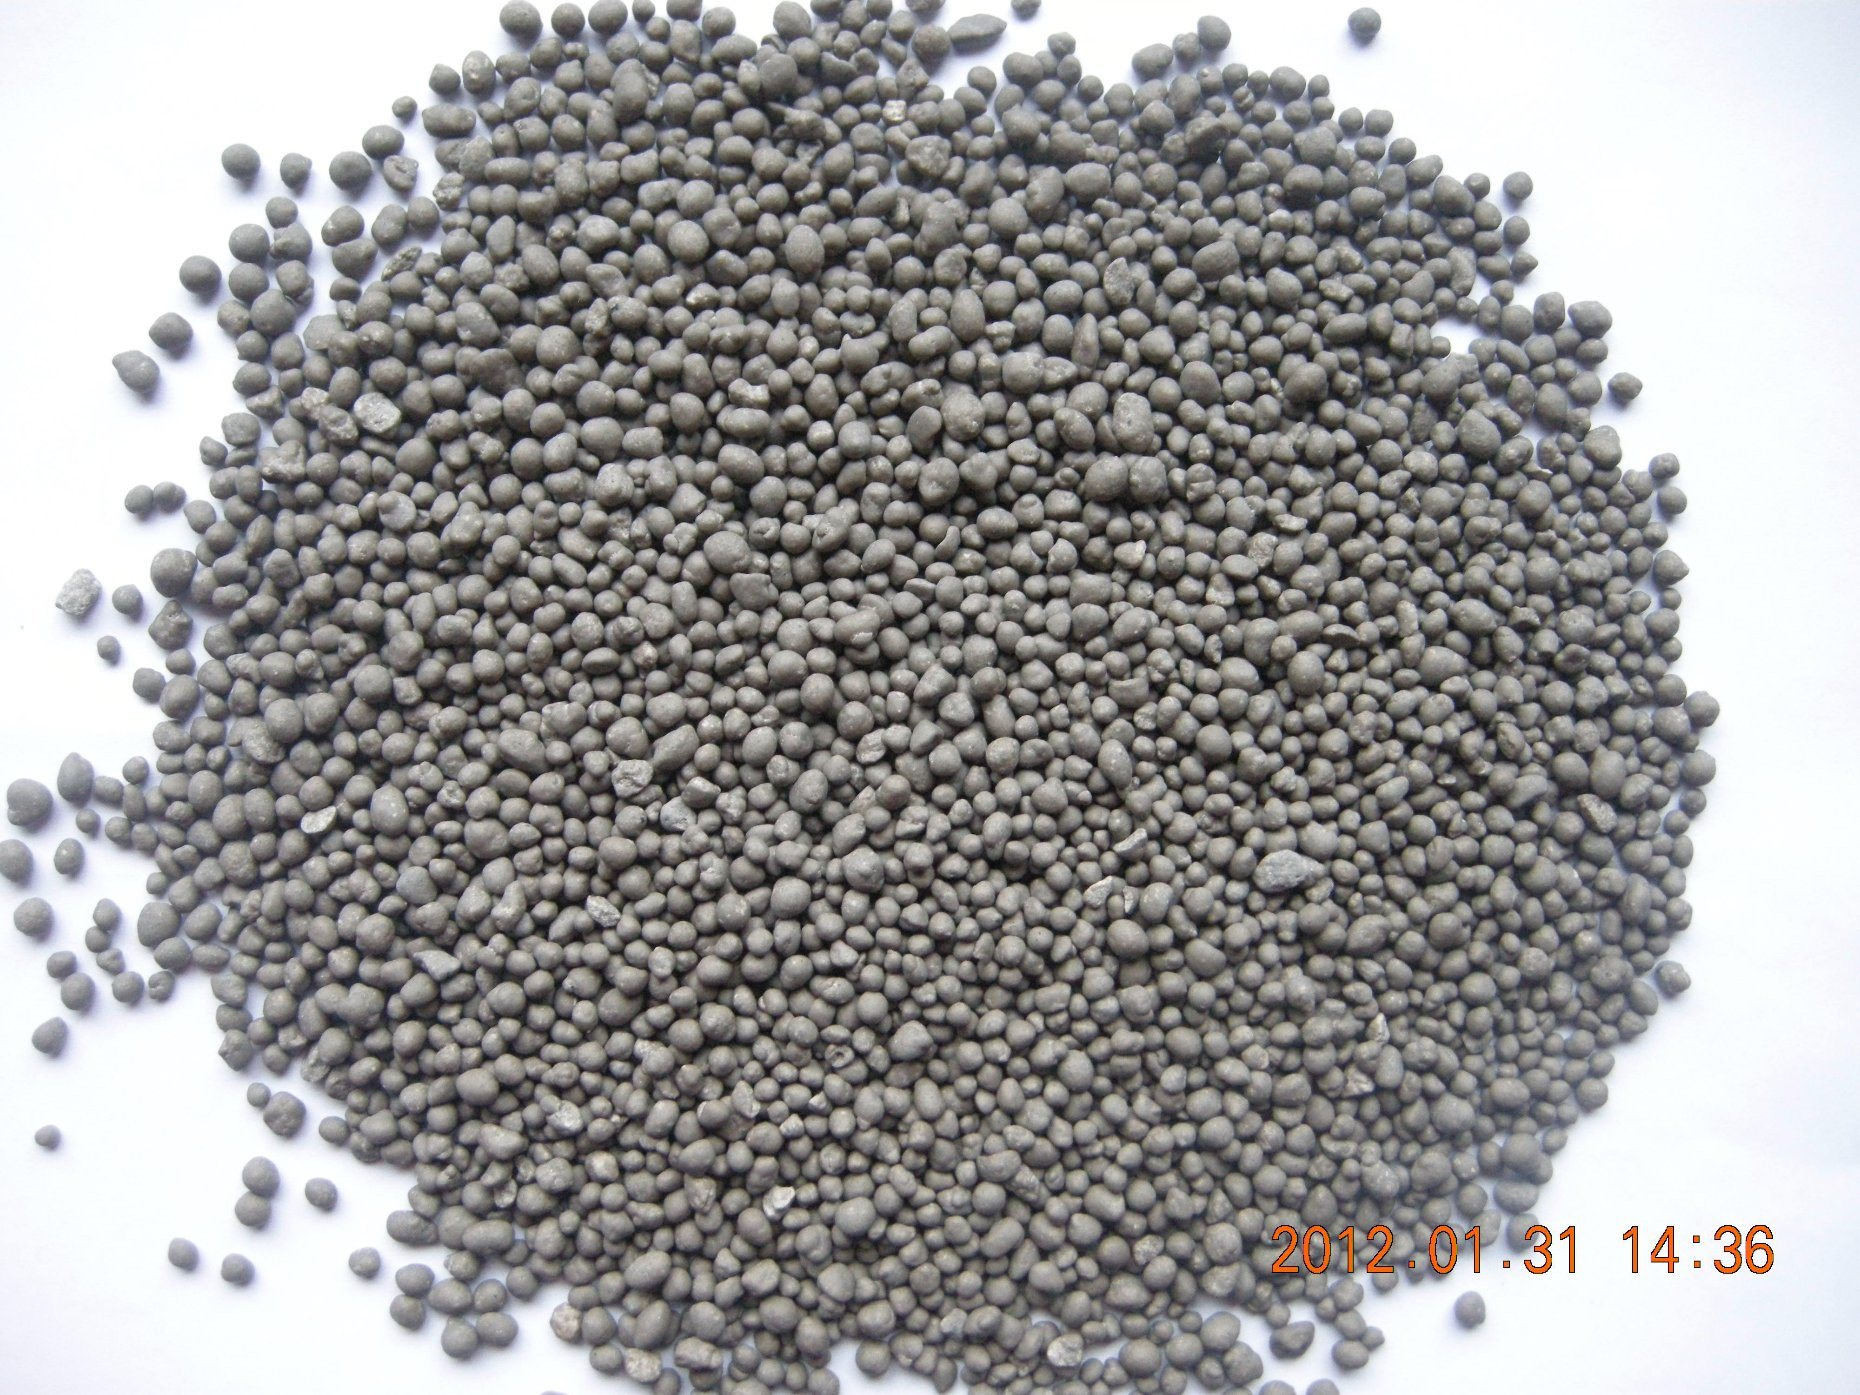 Triple Super Phosphate Fertilizer, Tsp Fertilizer